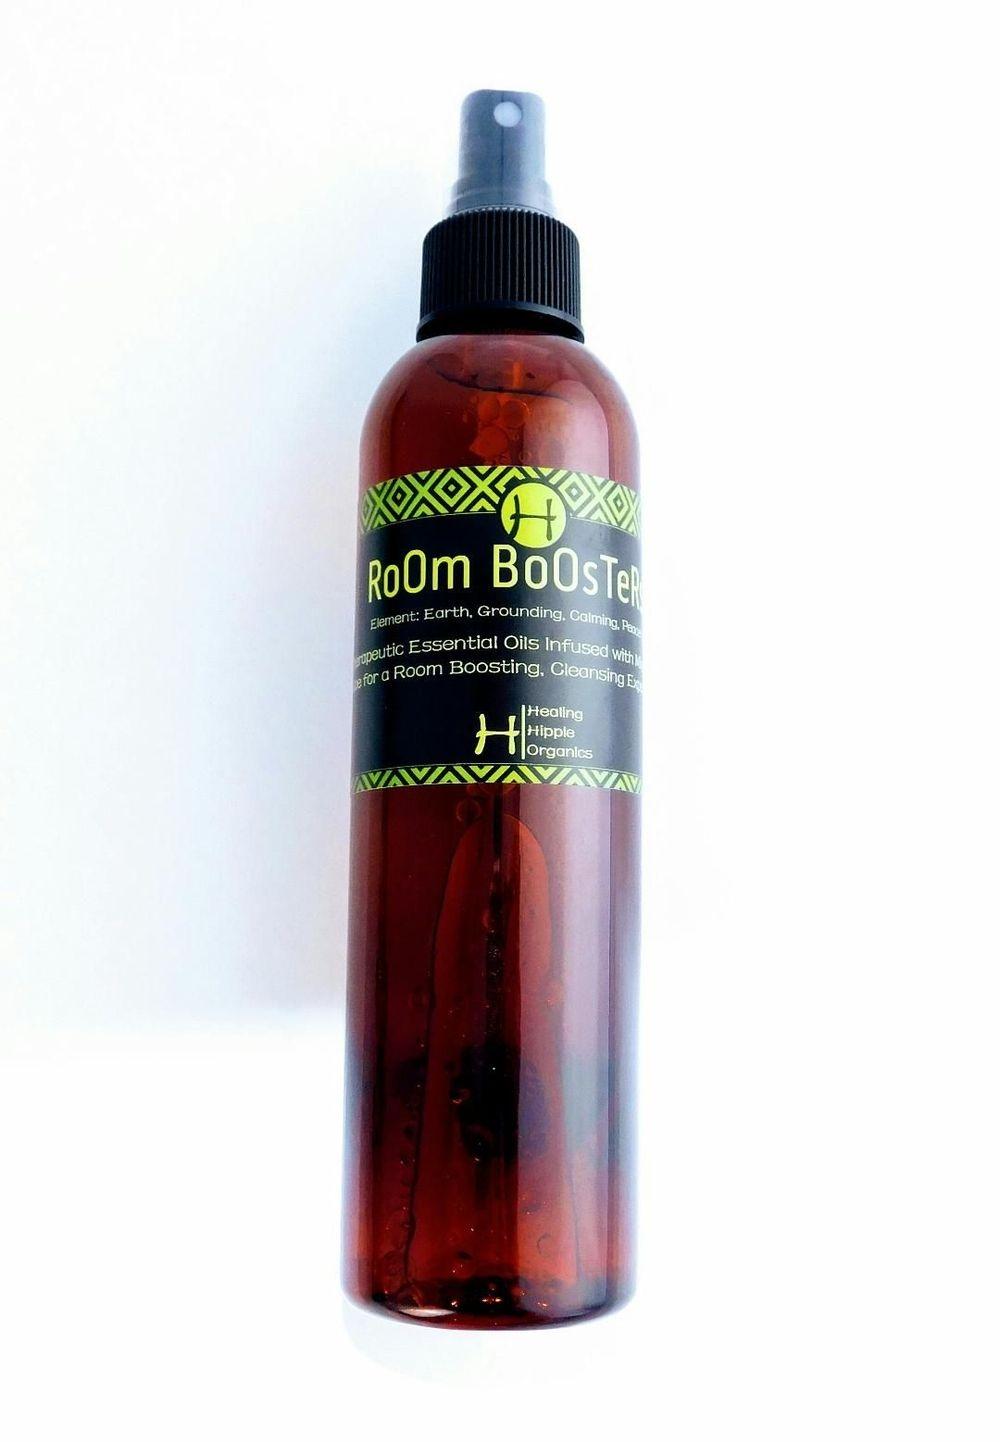 Room Booster: Earth, Healing Hippie Organics, Boise, Idaho, USA